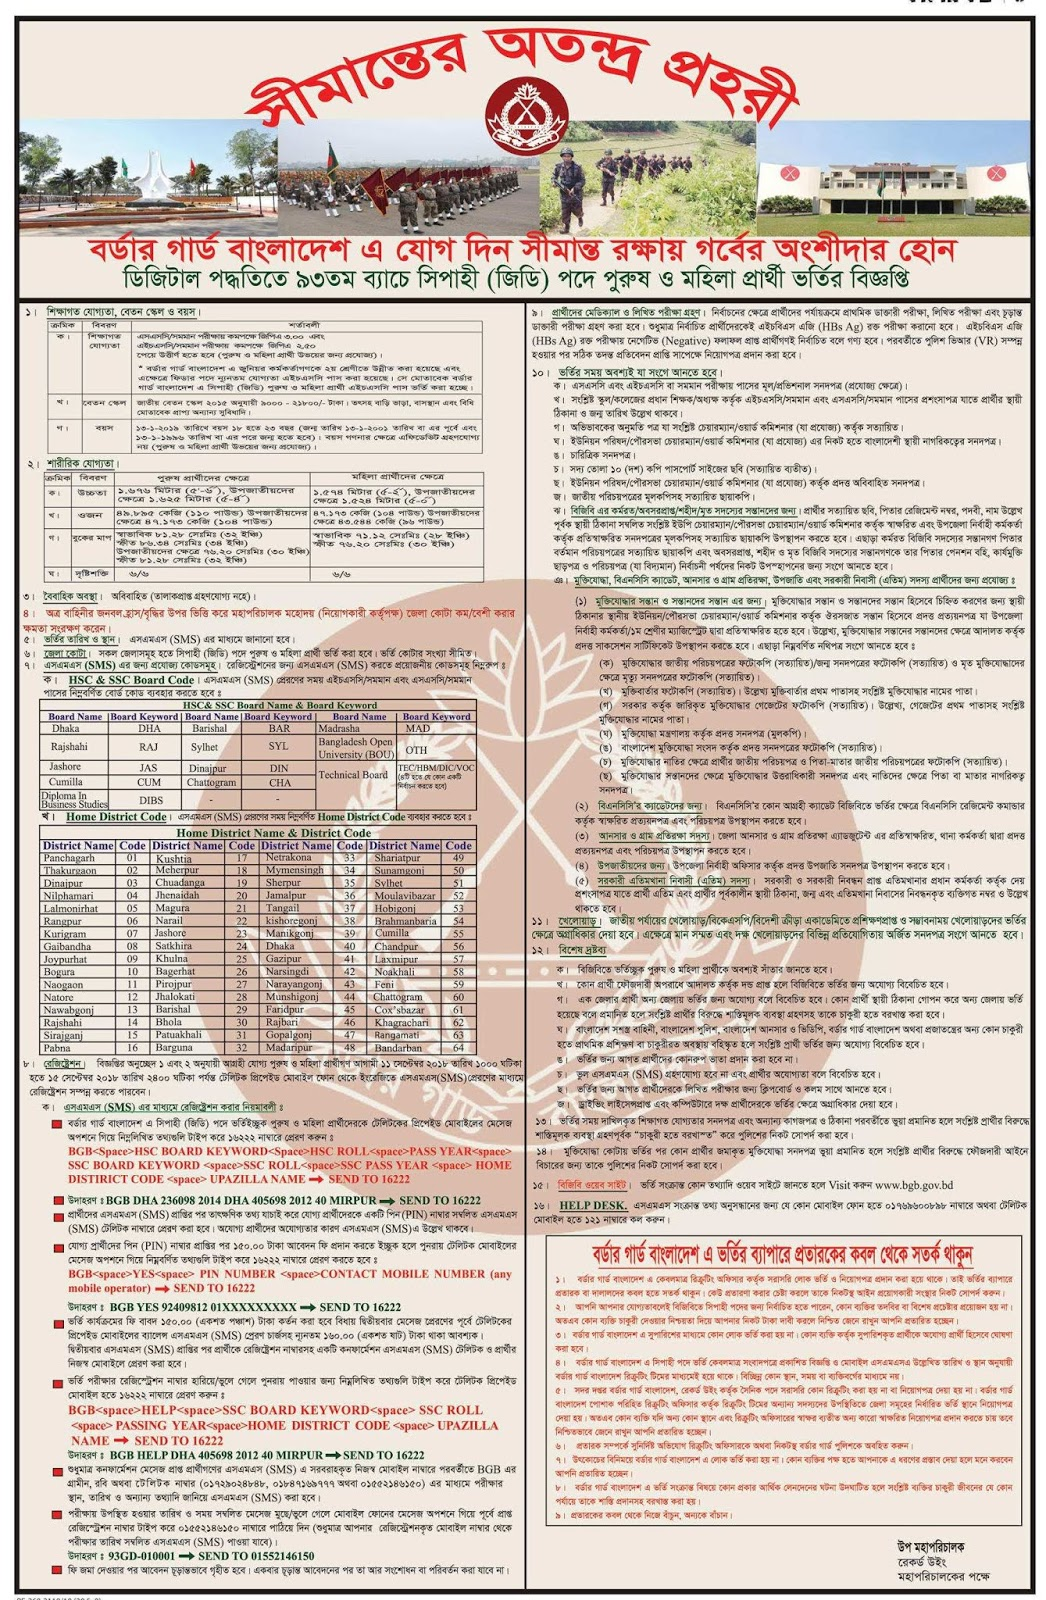 bgb job circular